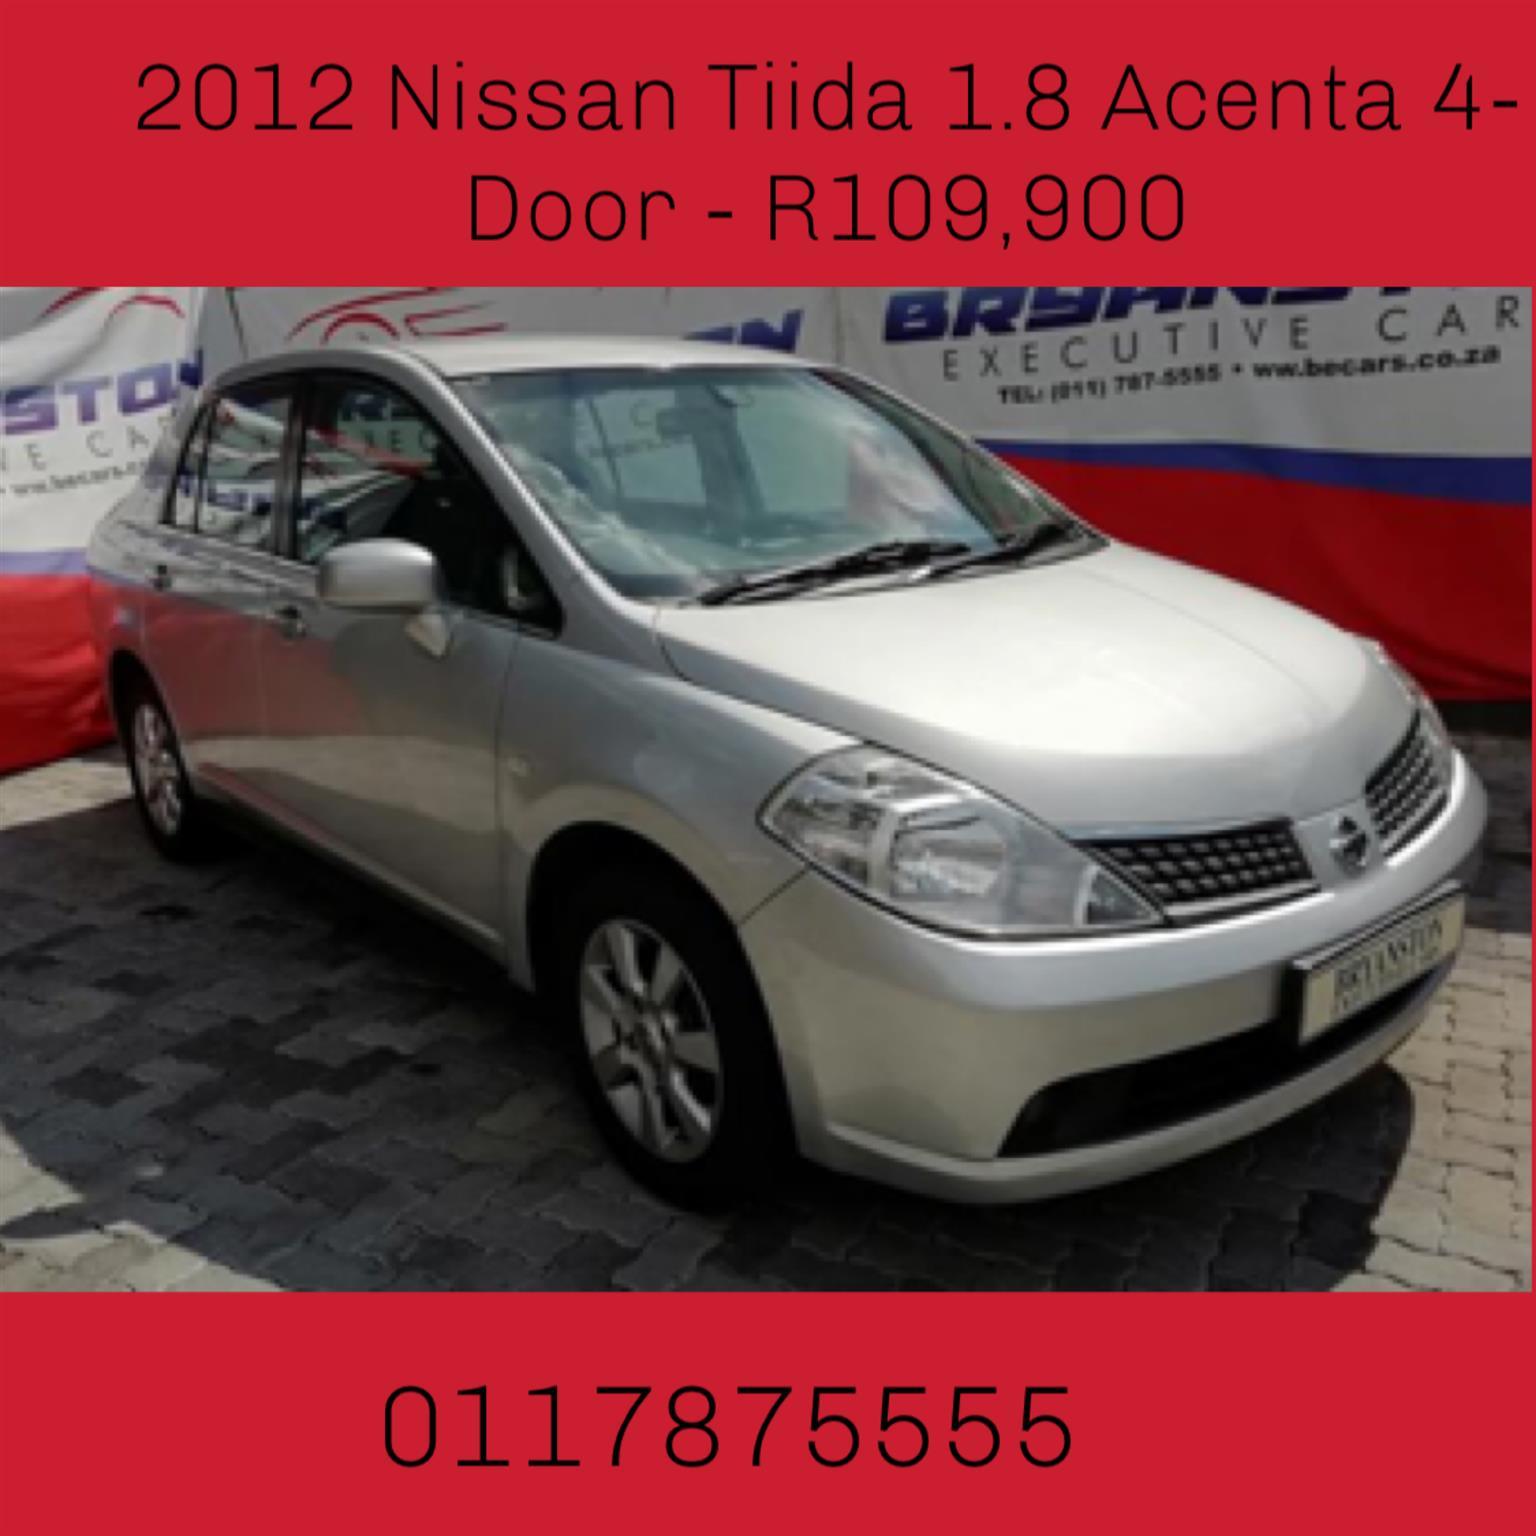 2012 Nissan Tiida hatch 1.8 Acenta